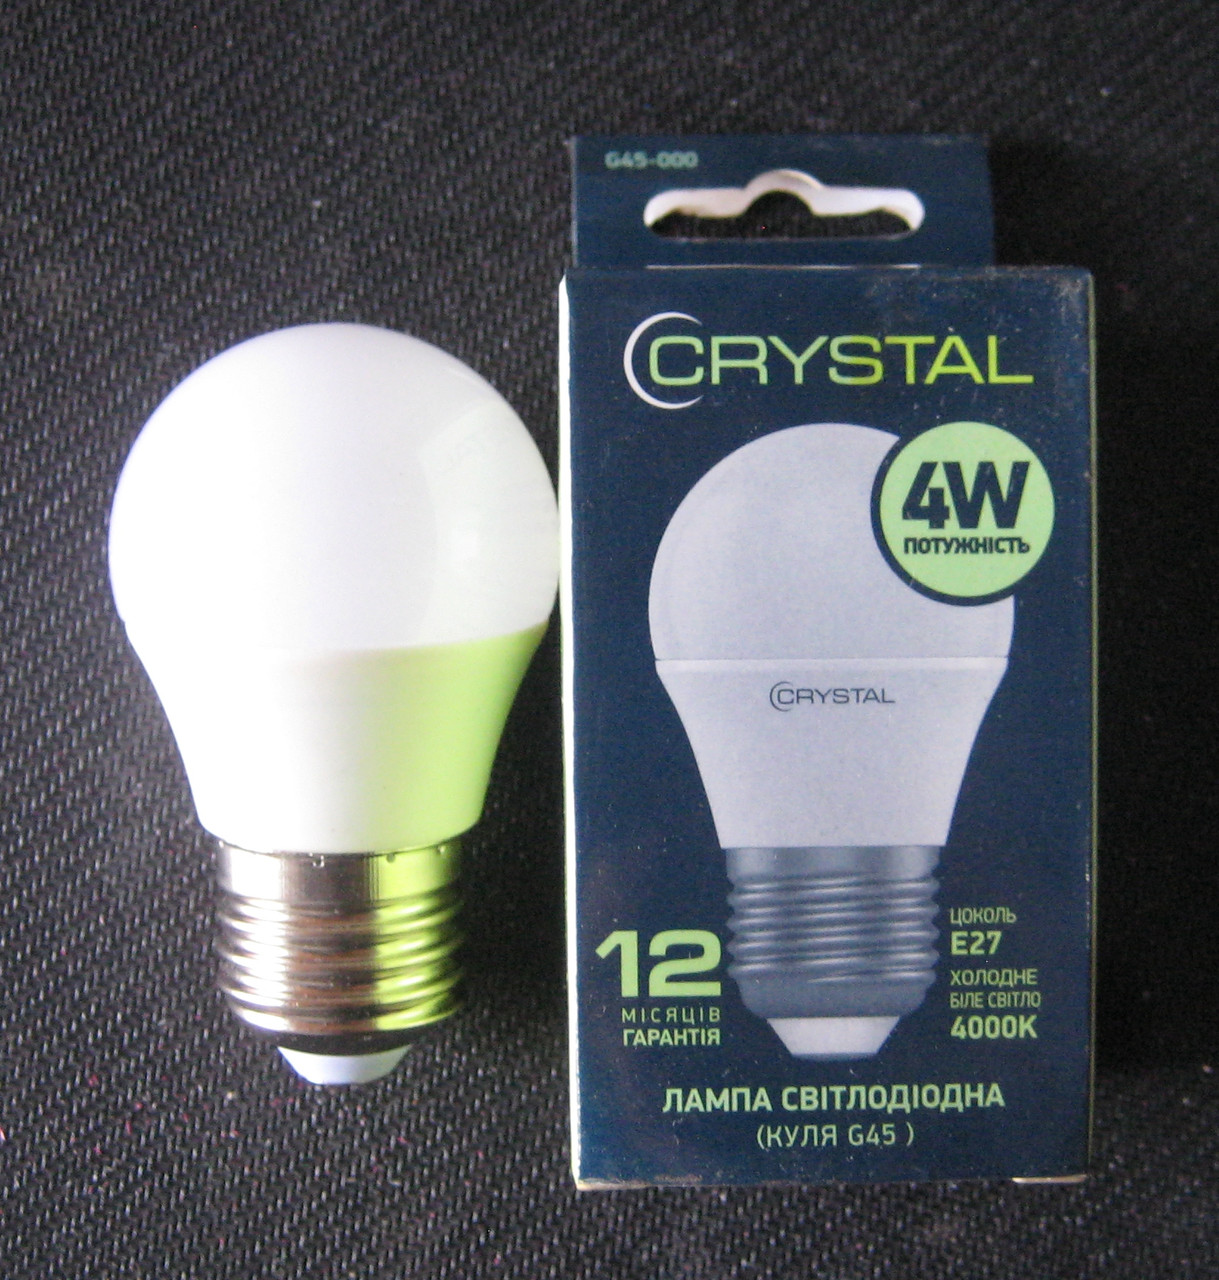 Лампа светодиодная Crystal 4W E27 4000K G45 (сфера)